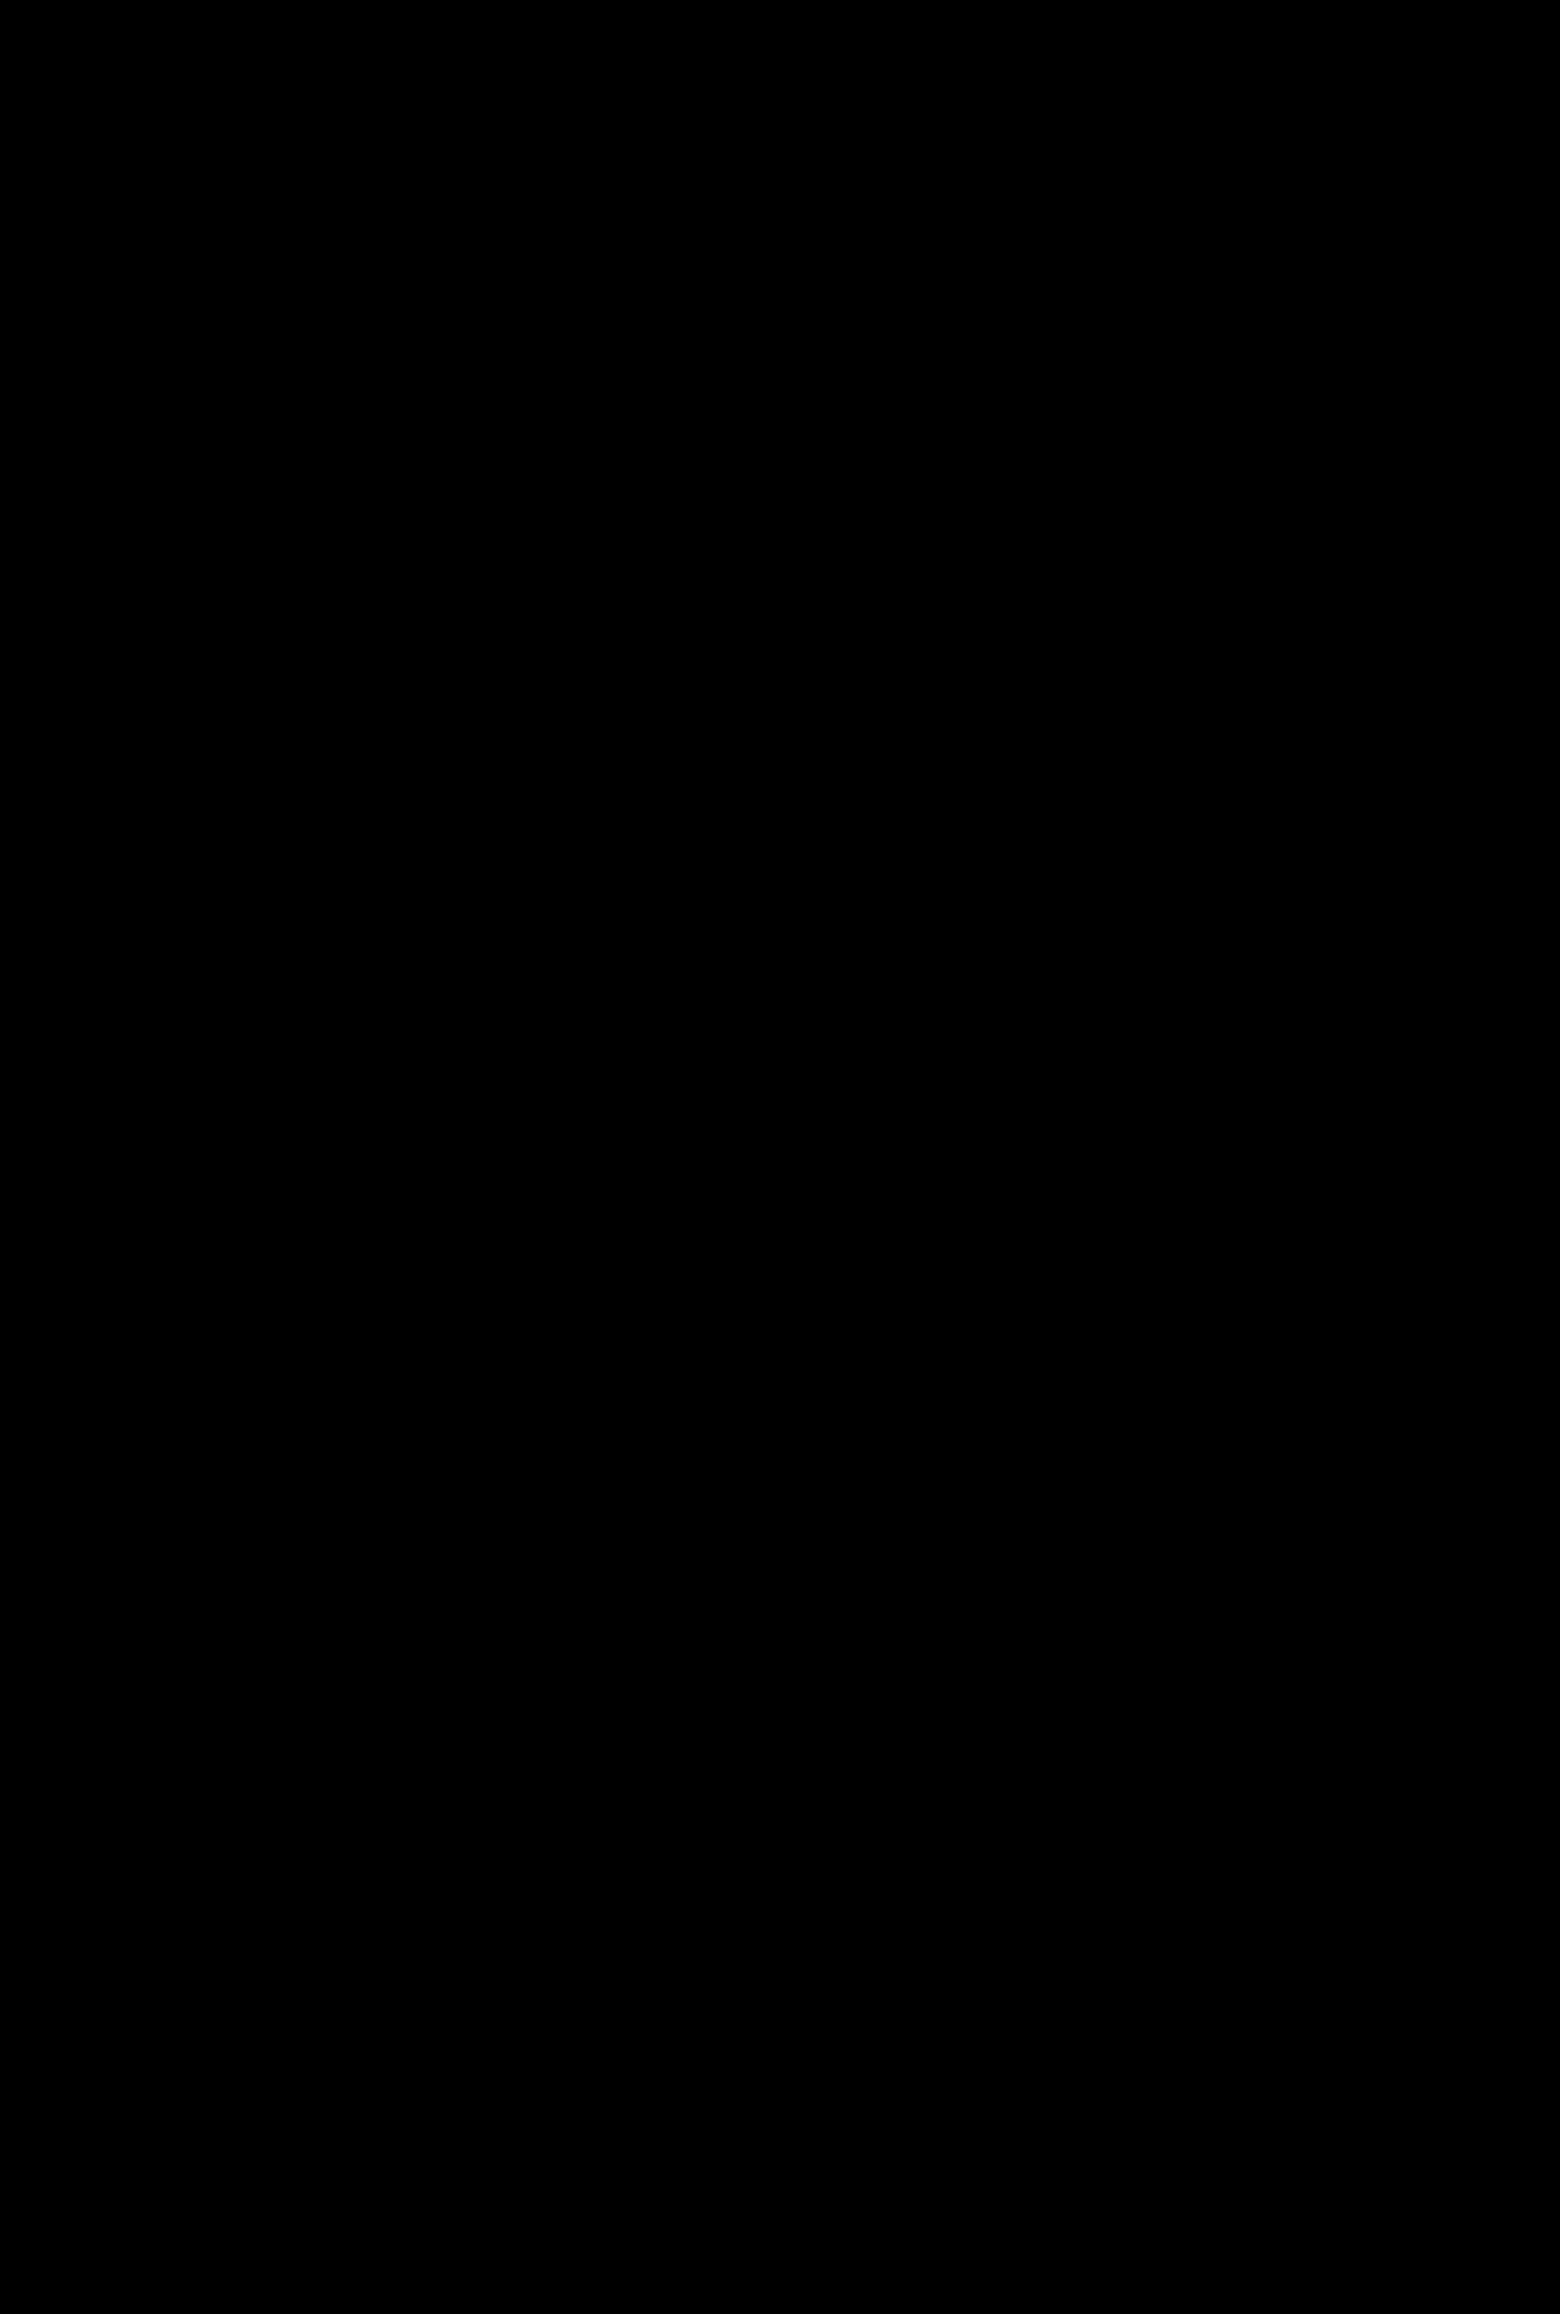 1560x2314 Clipart